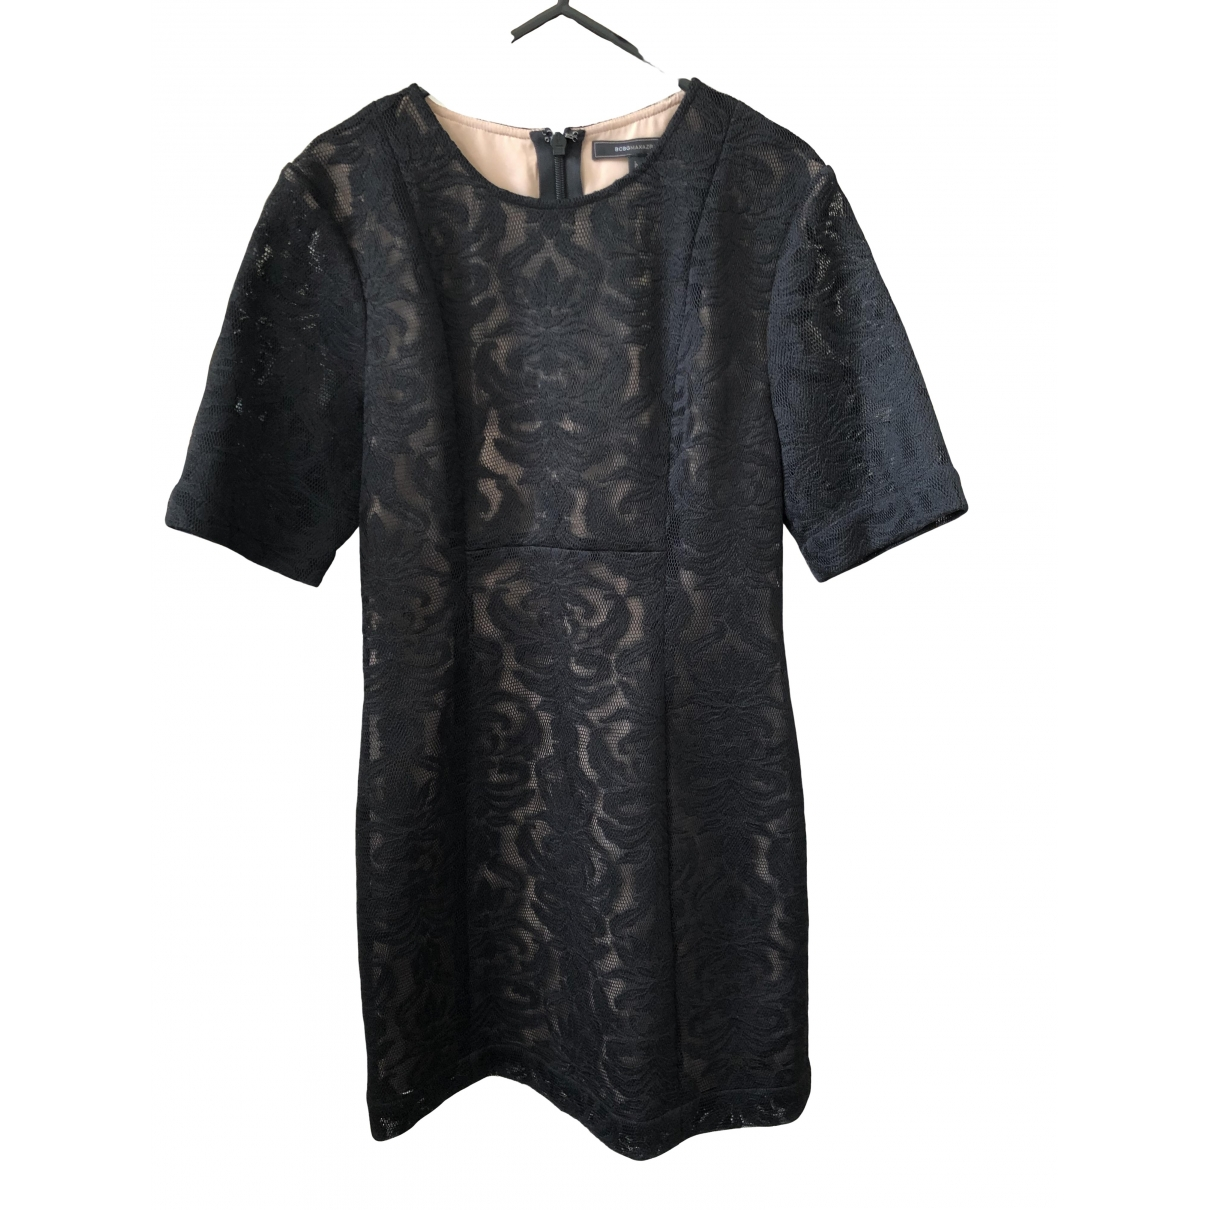 Bcbg Max Azria \N Black dress for Women 2 US